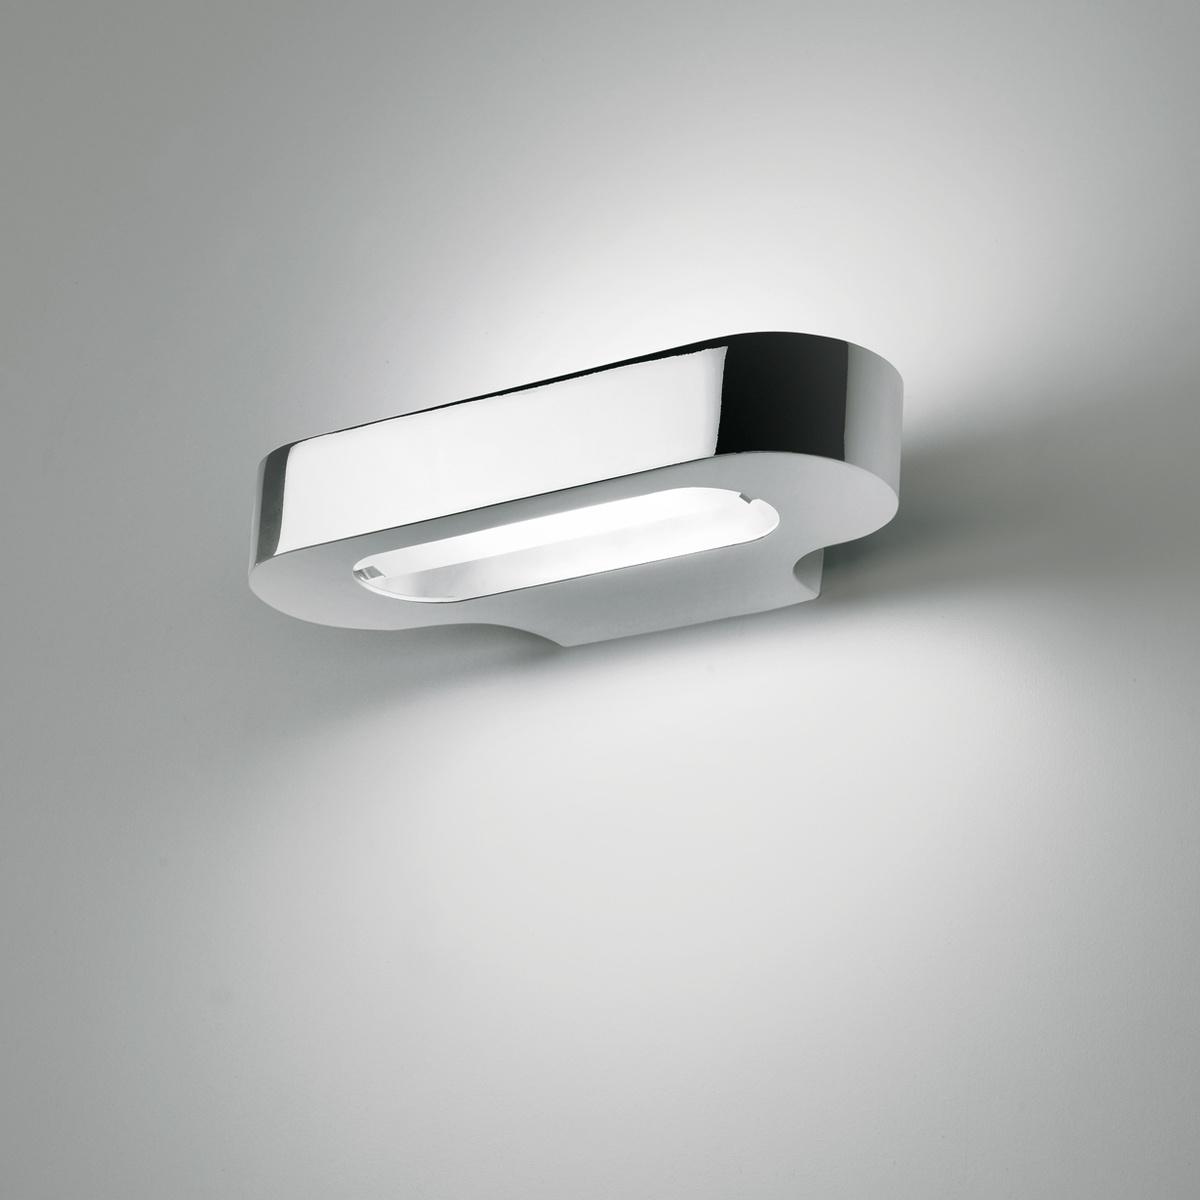 Lampada da parete e applique talo led cromo lucido by artemide lovethesign - Applique da parete led ...